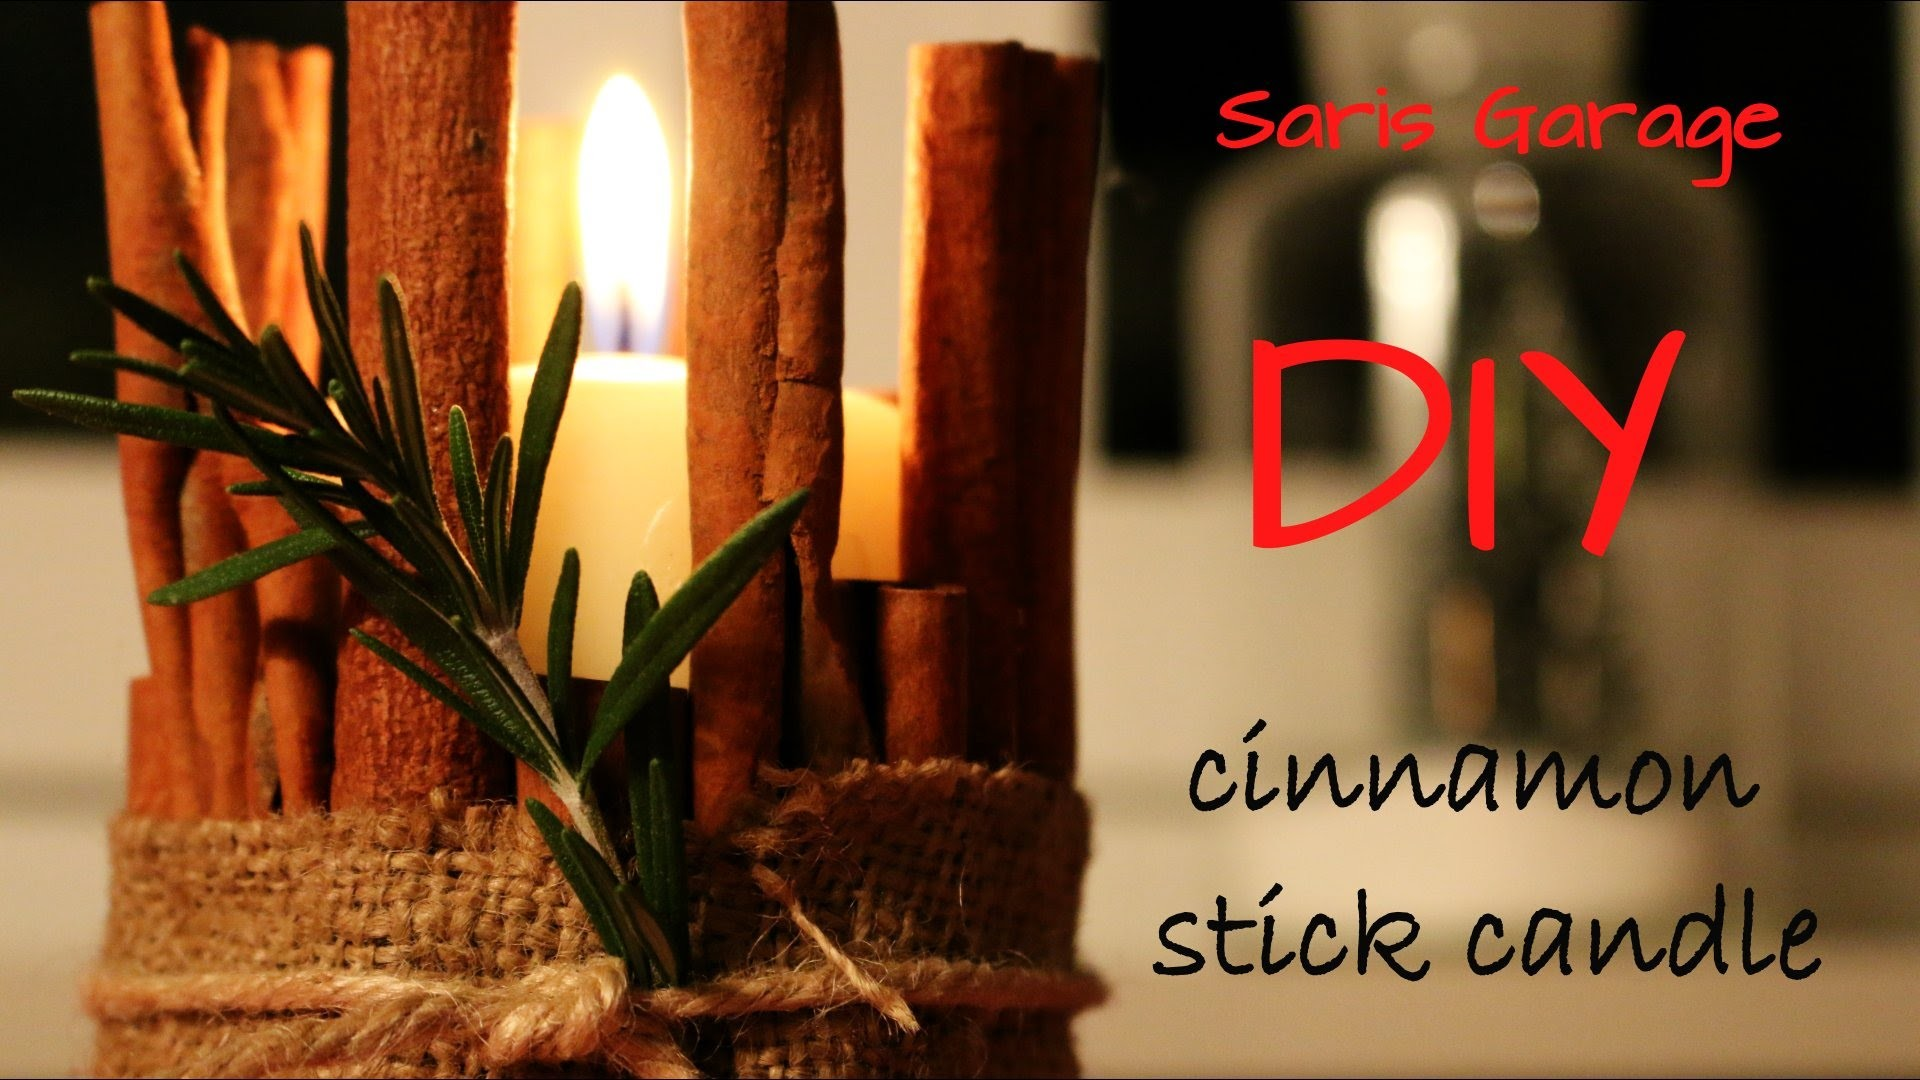 Zimtkerze. Cinnamon stick candle. DIY. X-MAS SPECIAL.